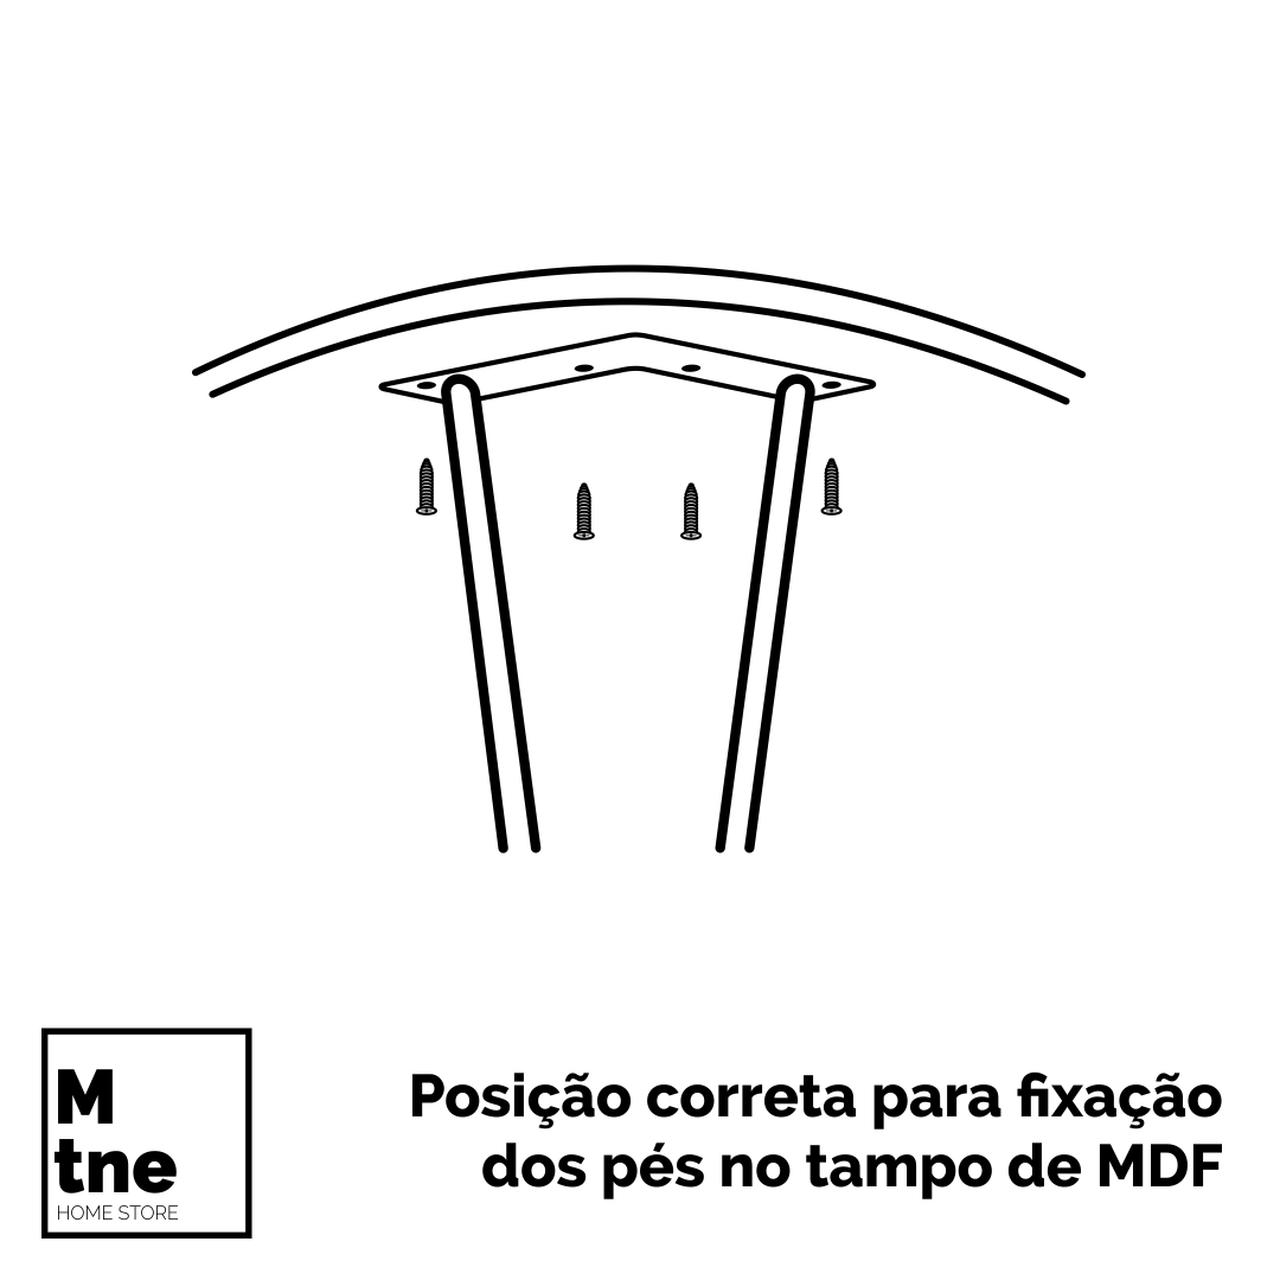 Mesa de Apoio 35 cm Antiqua com Hairpin Legs e Tampo 100% MDF  - Mtne Store